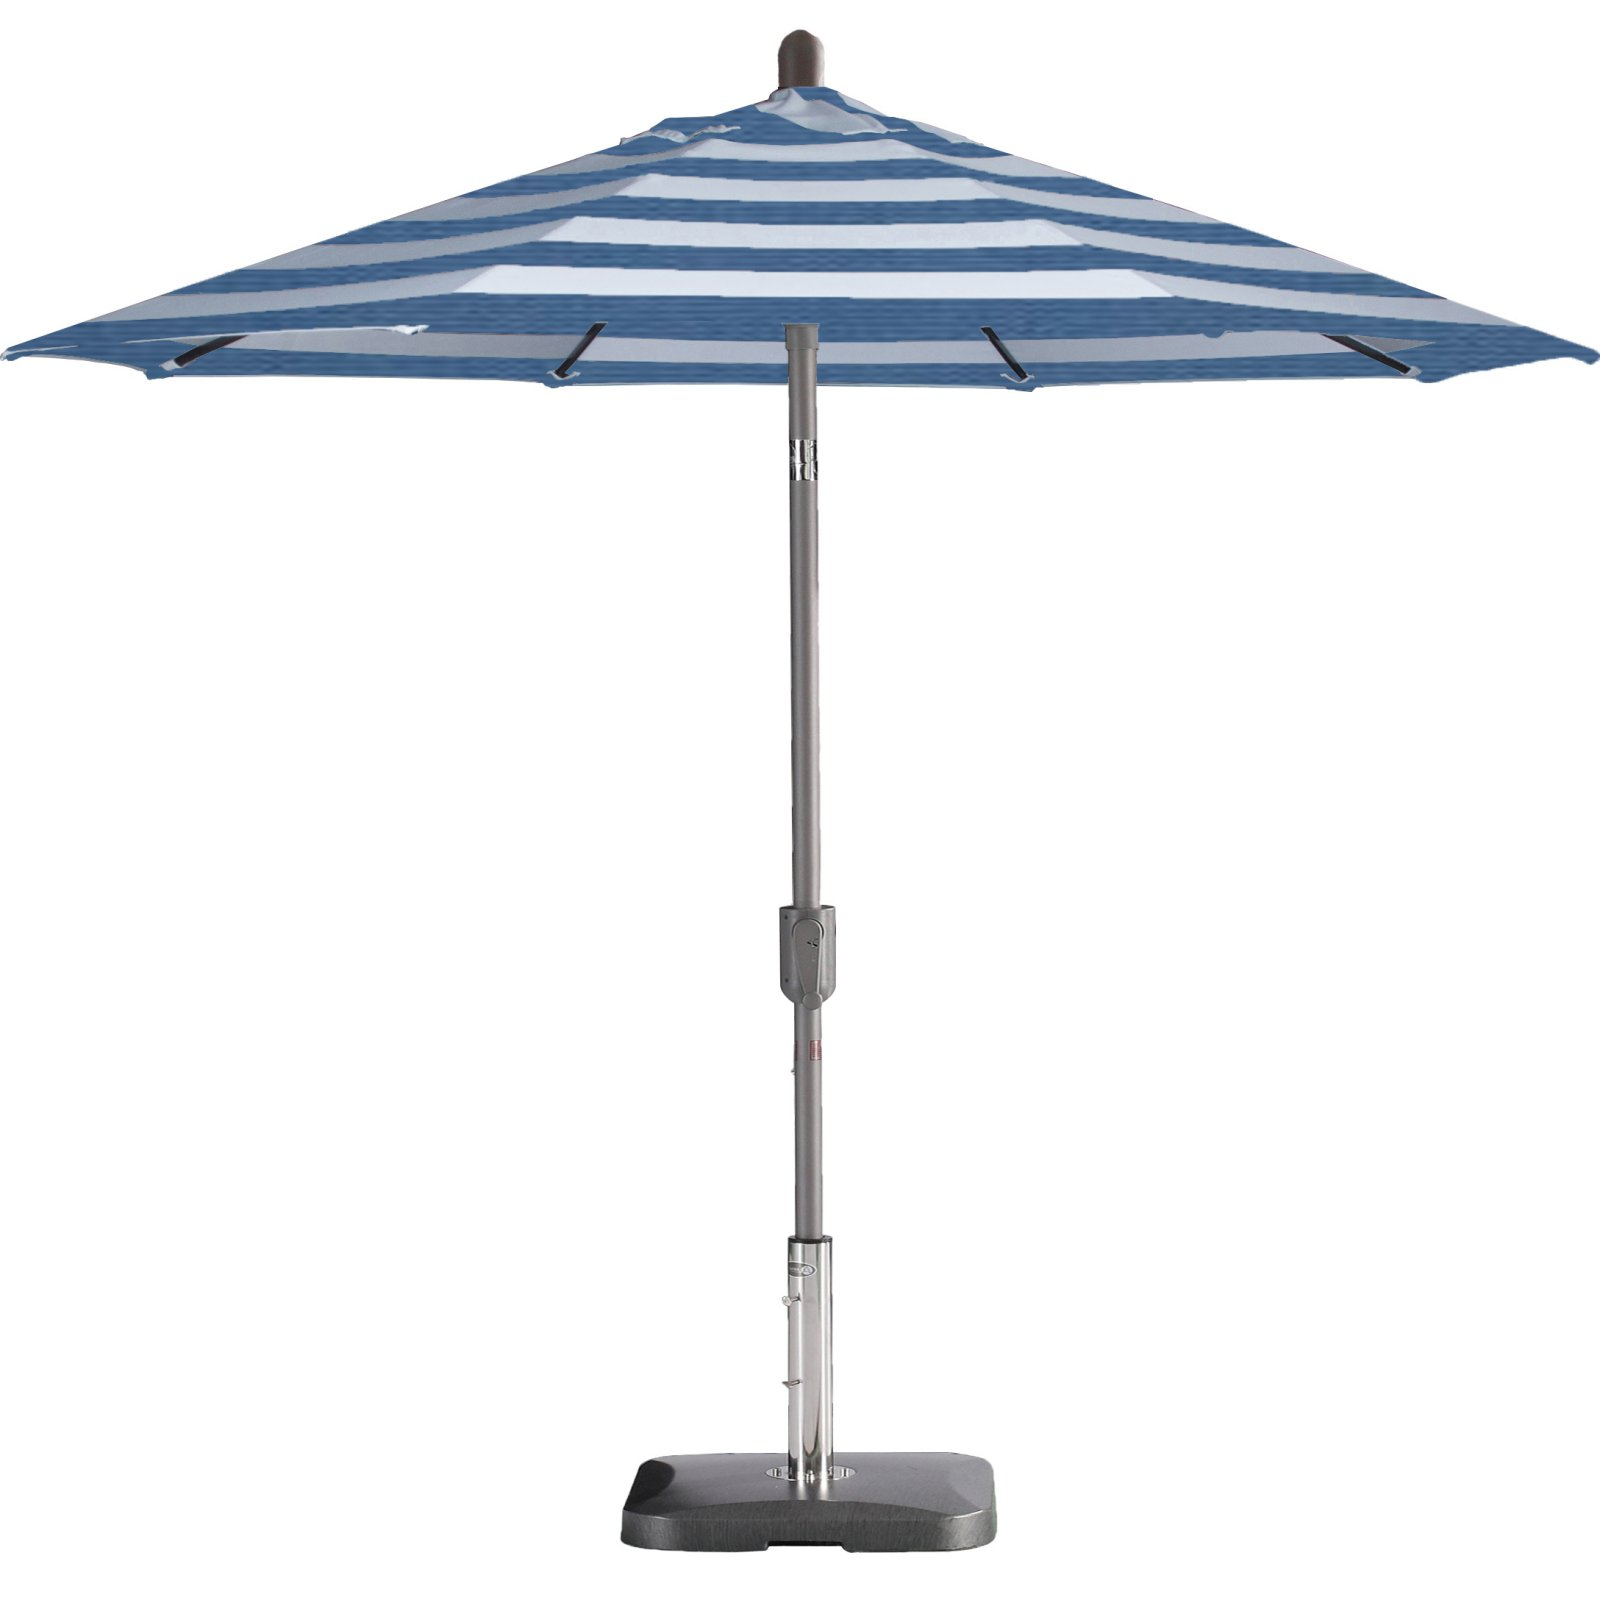 Pinterest – Österreich Regarding 2019 Caravelle Market Sunbrella Umbrellas (View 20 of 20)